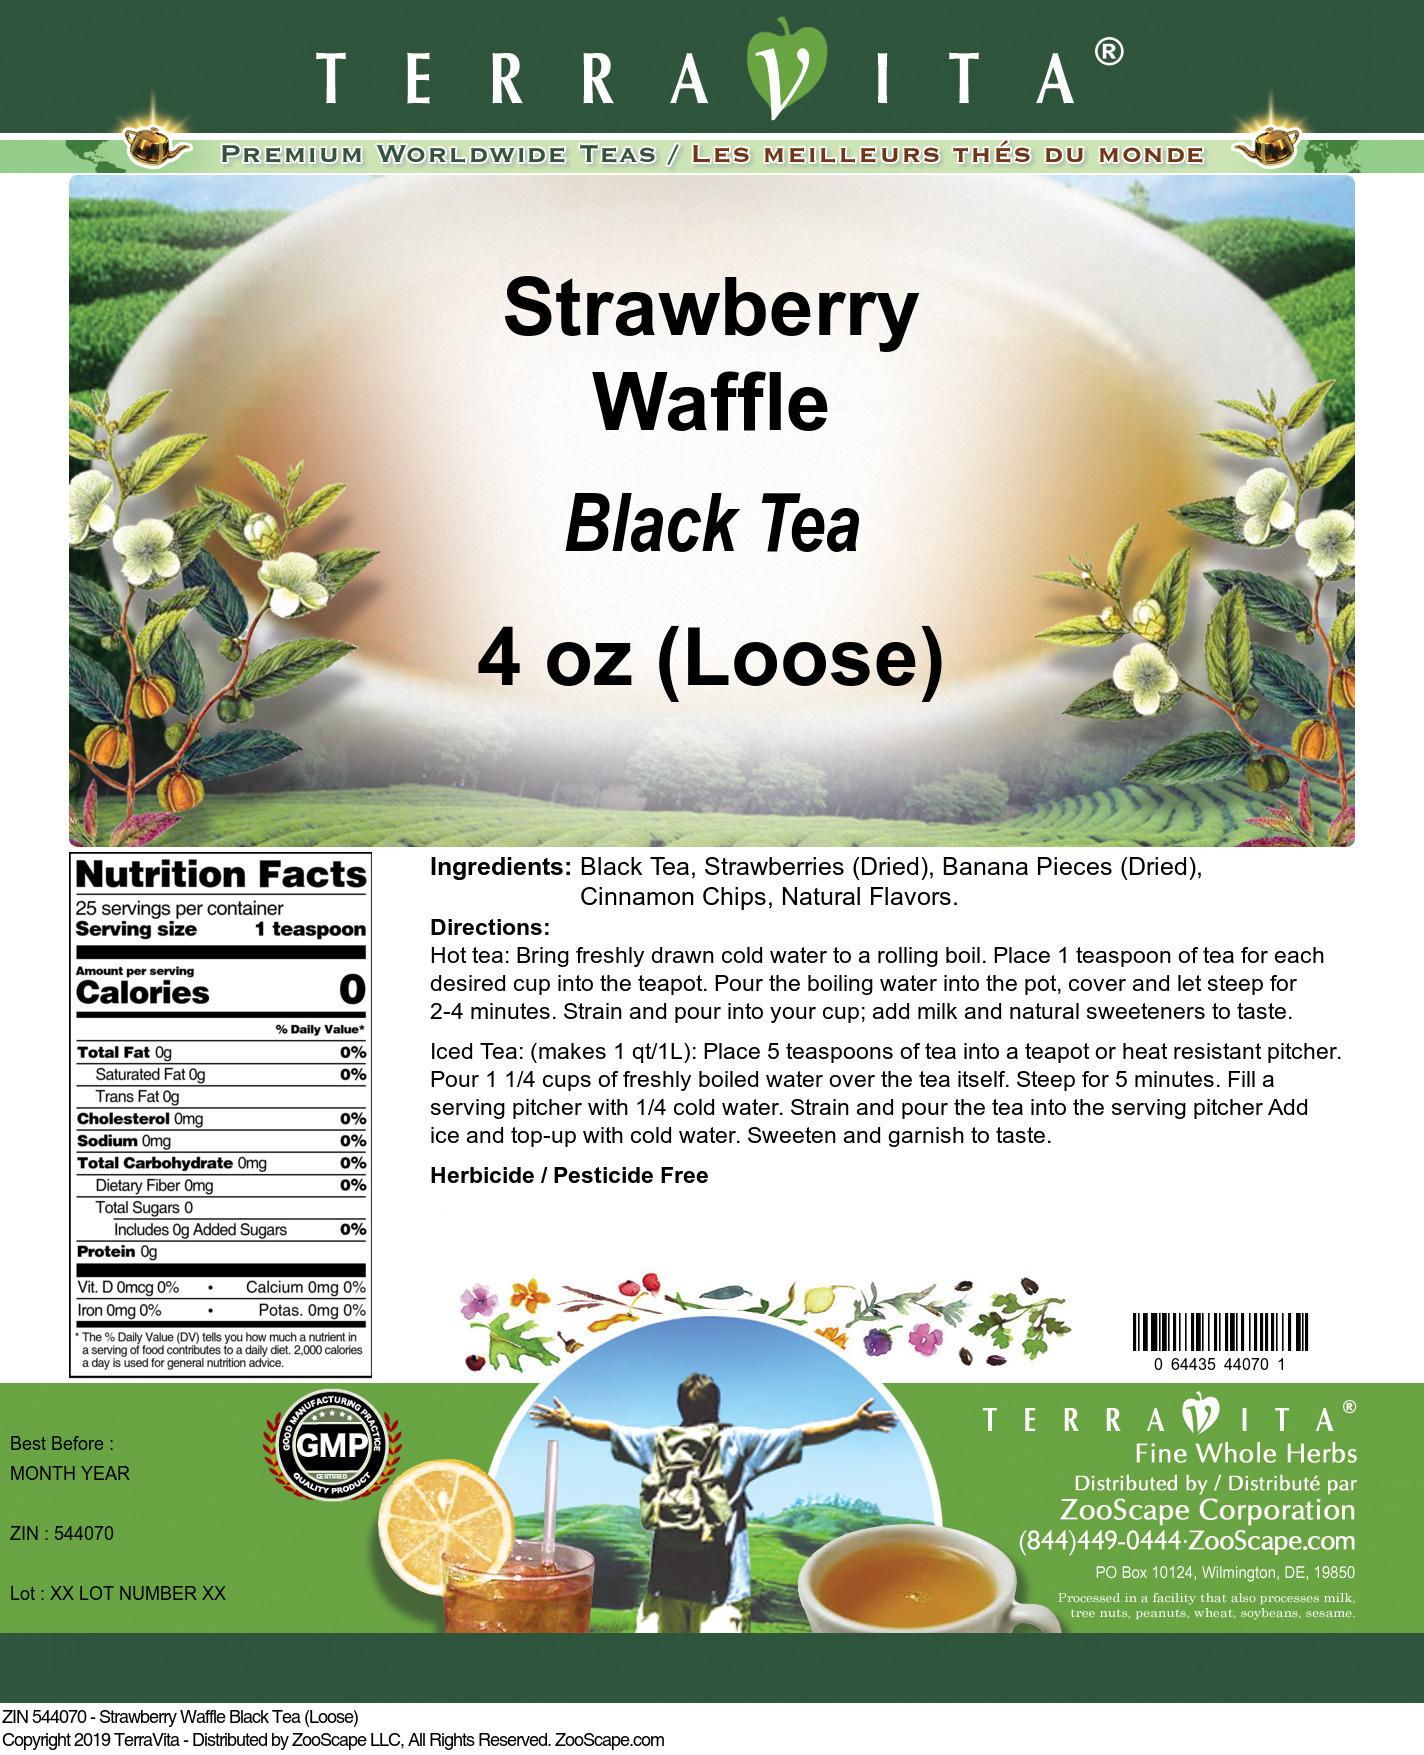 Strawberry Waffle Black Tea (Loose)